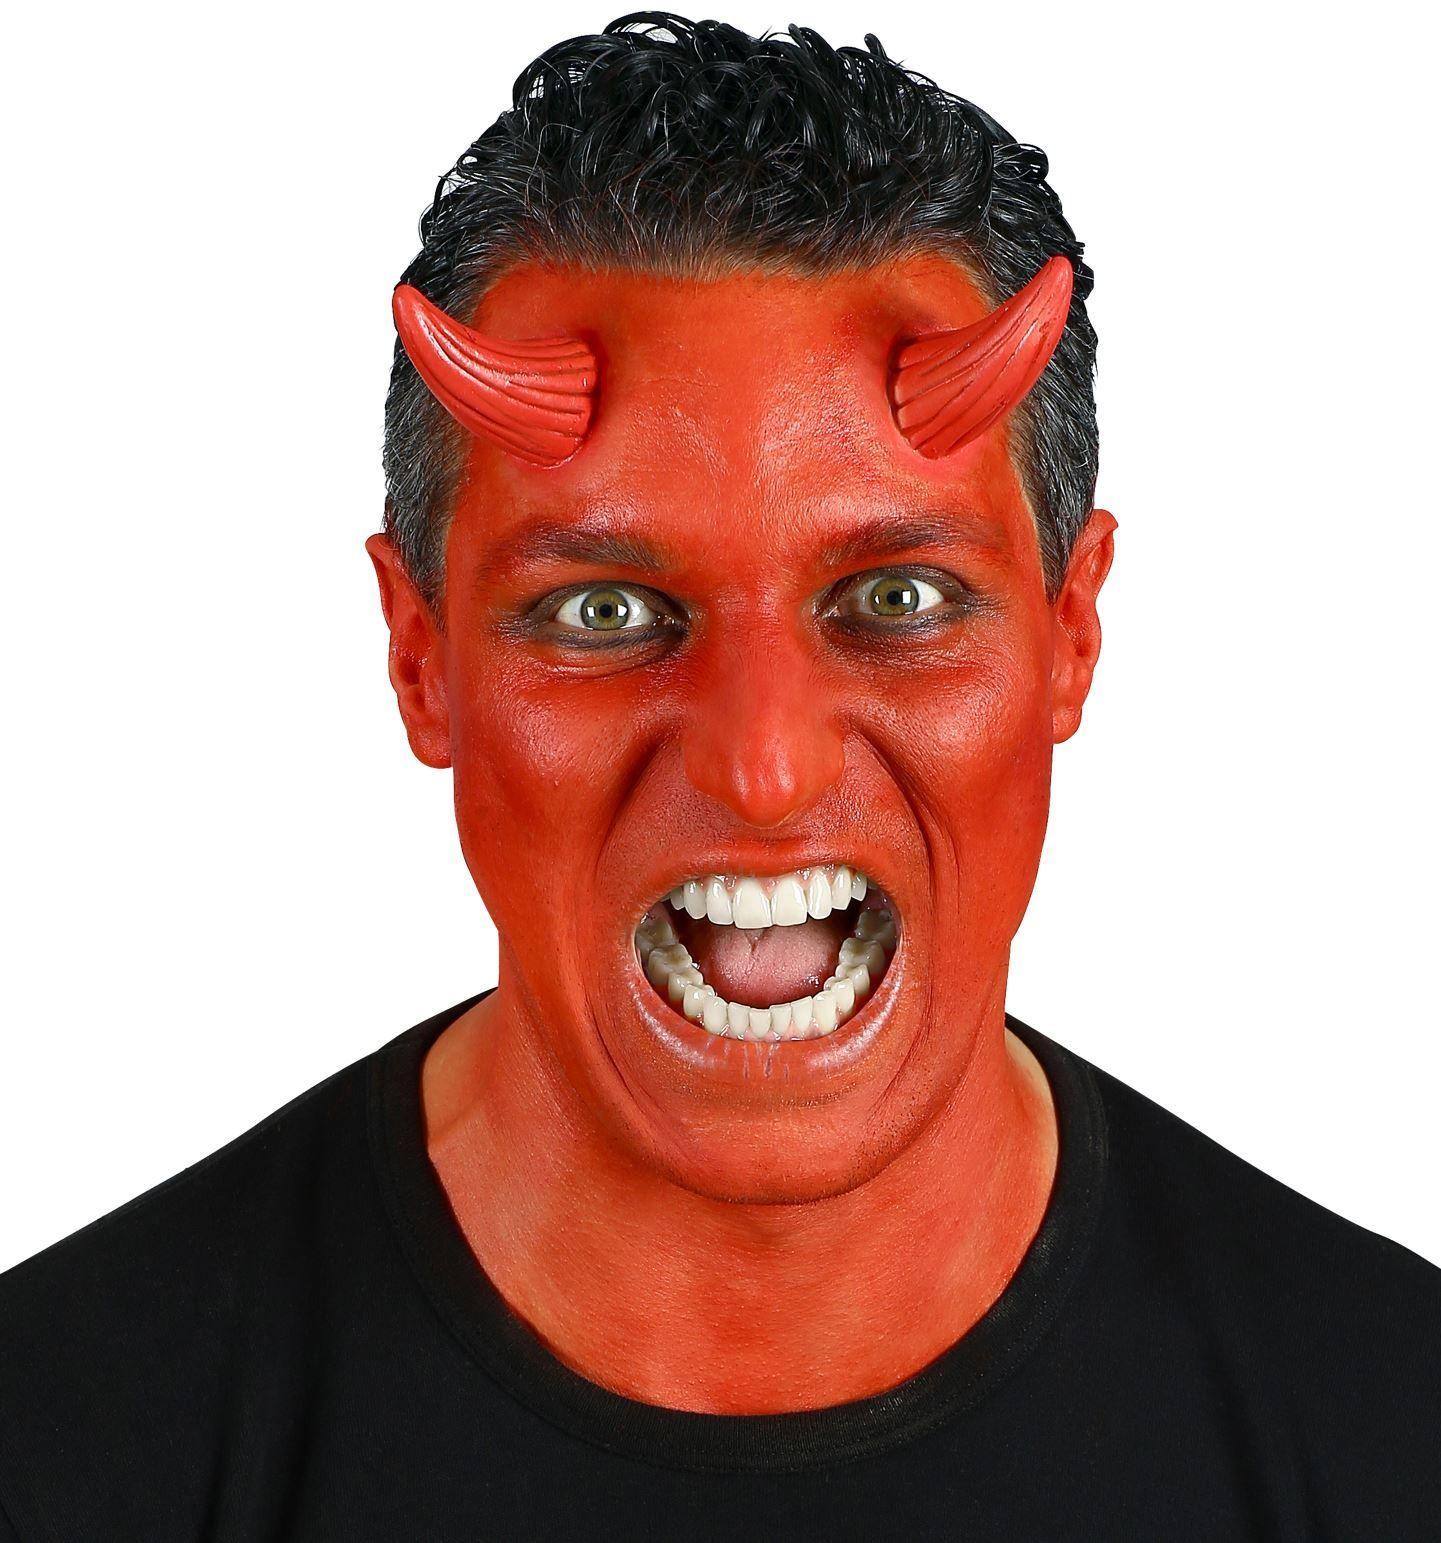 Rode duivel oortjes opplakbaar